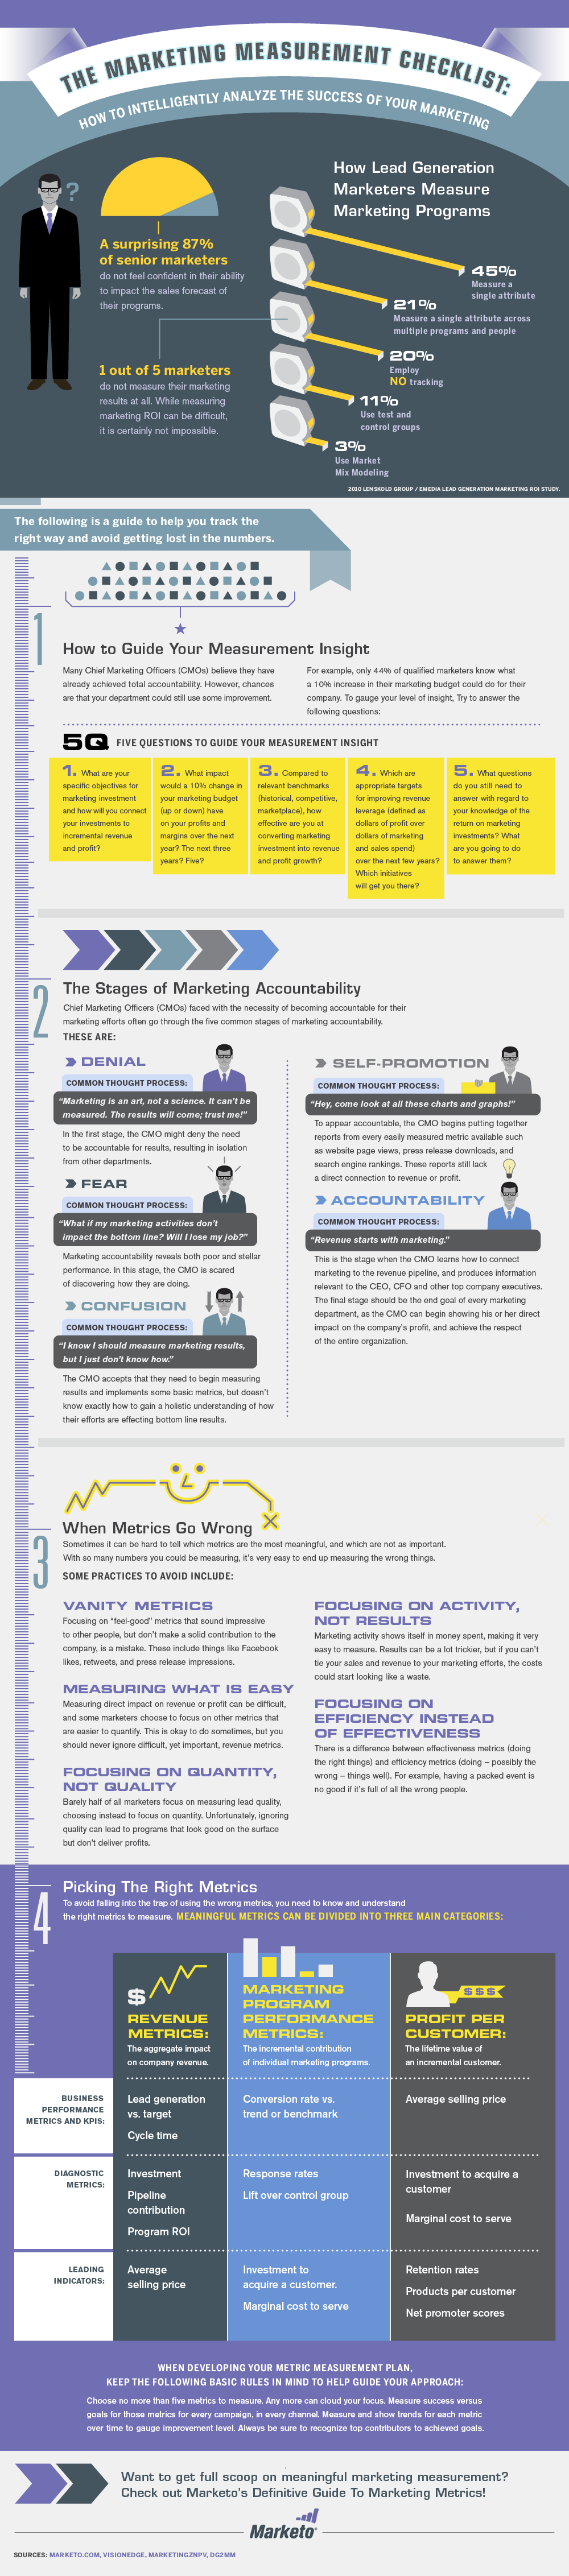 The Marketing Measurement Checklist